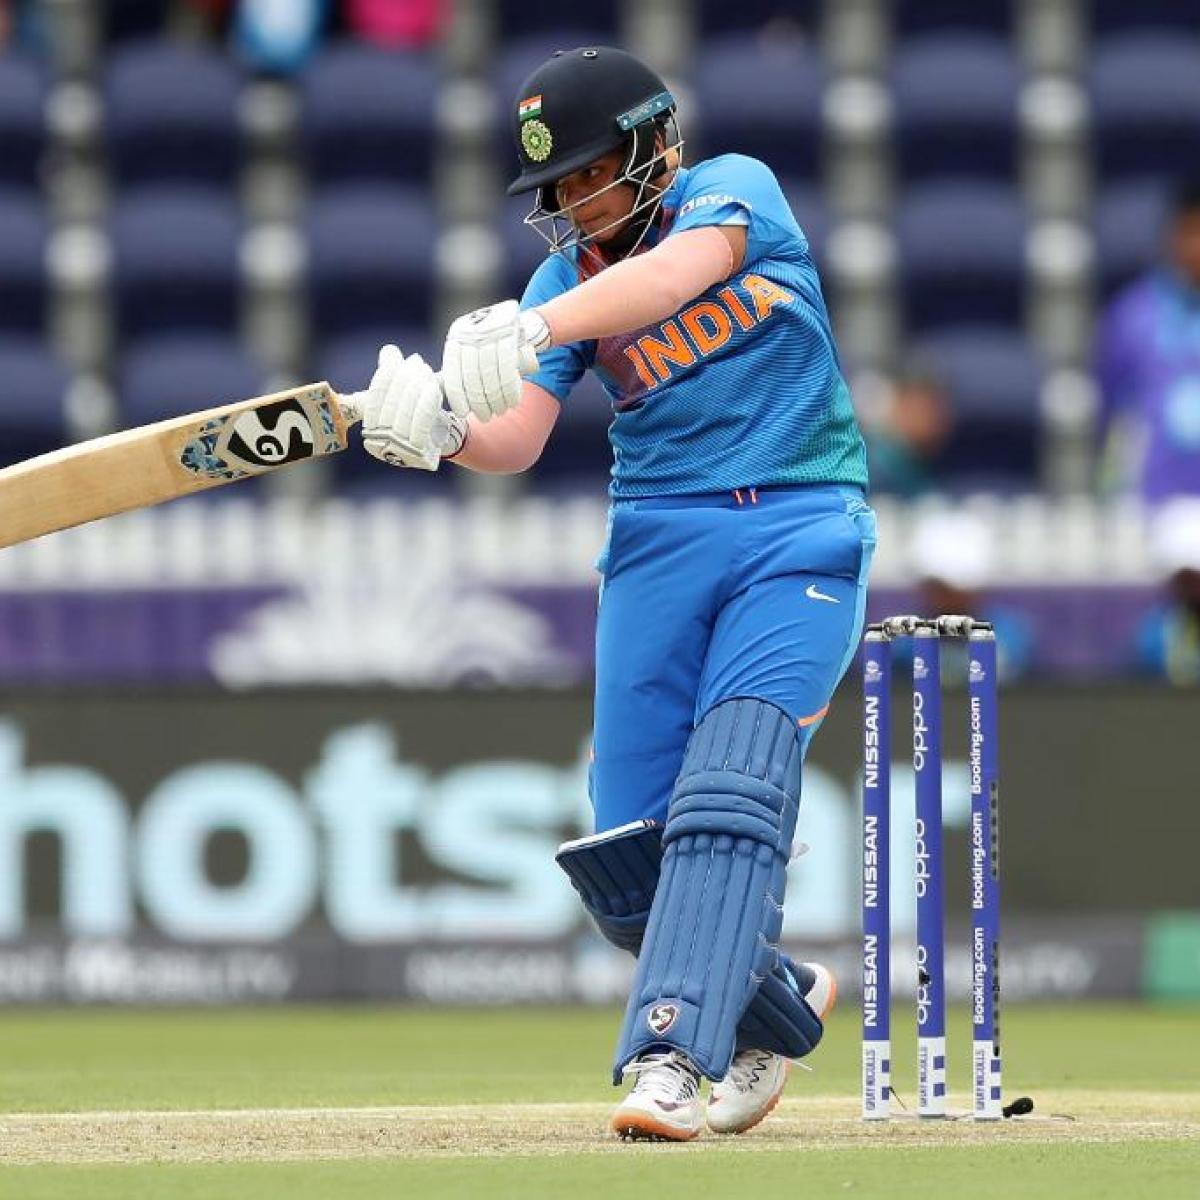 'Someone who loves to play big shots': Skipper Harmanpreet Kaur heaps praise on teenager Shafali Verma